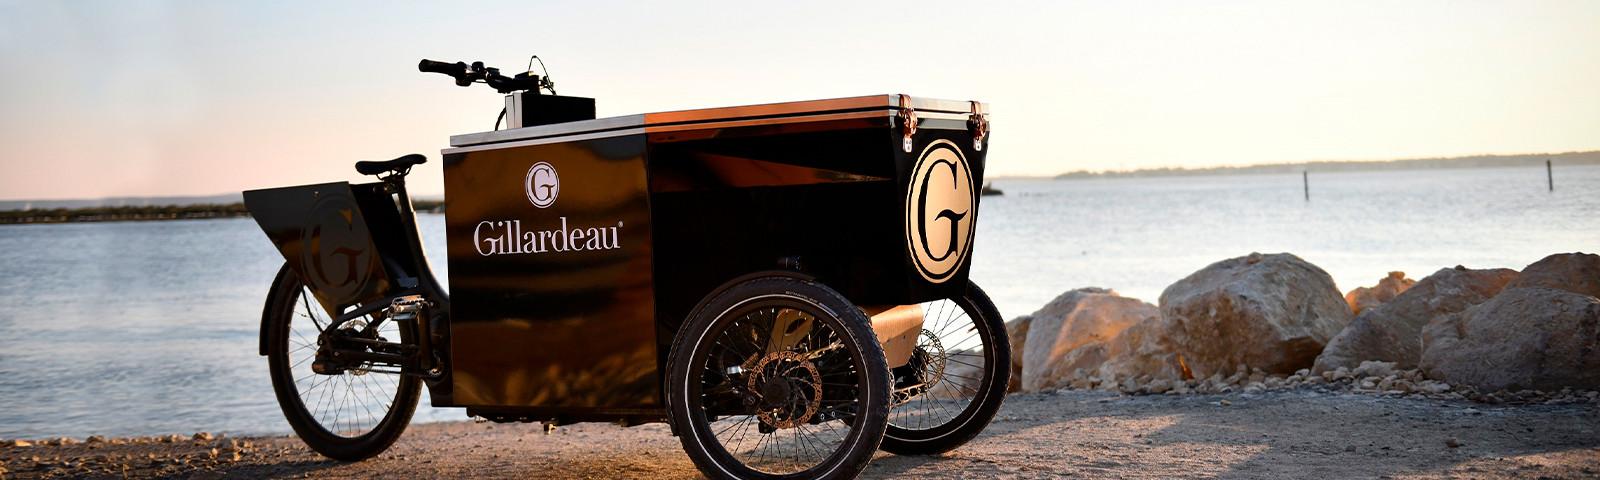 El Peugeot Design Lab crea un innovador triciclo para degustar ostras Gillardeau